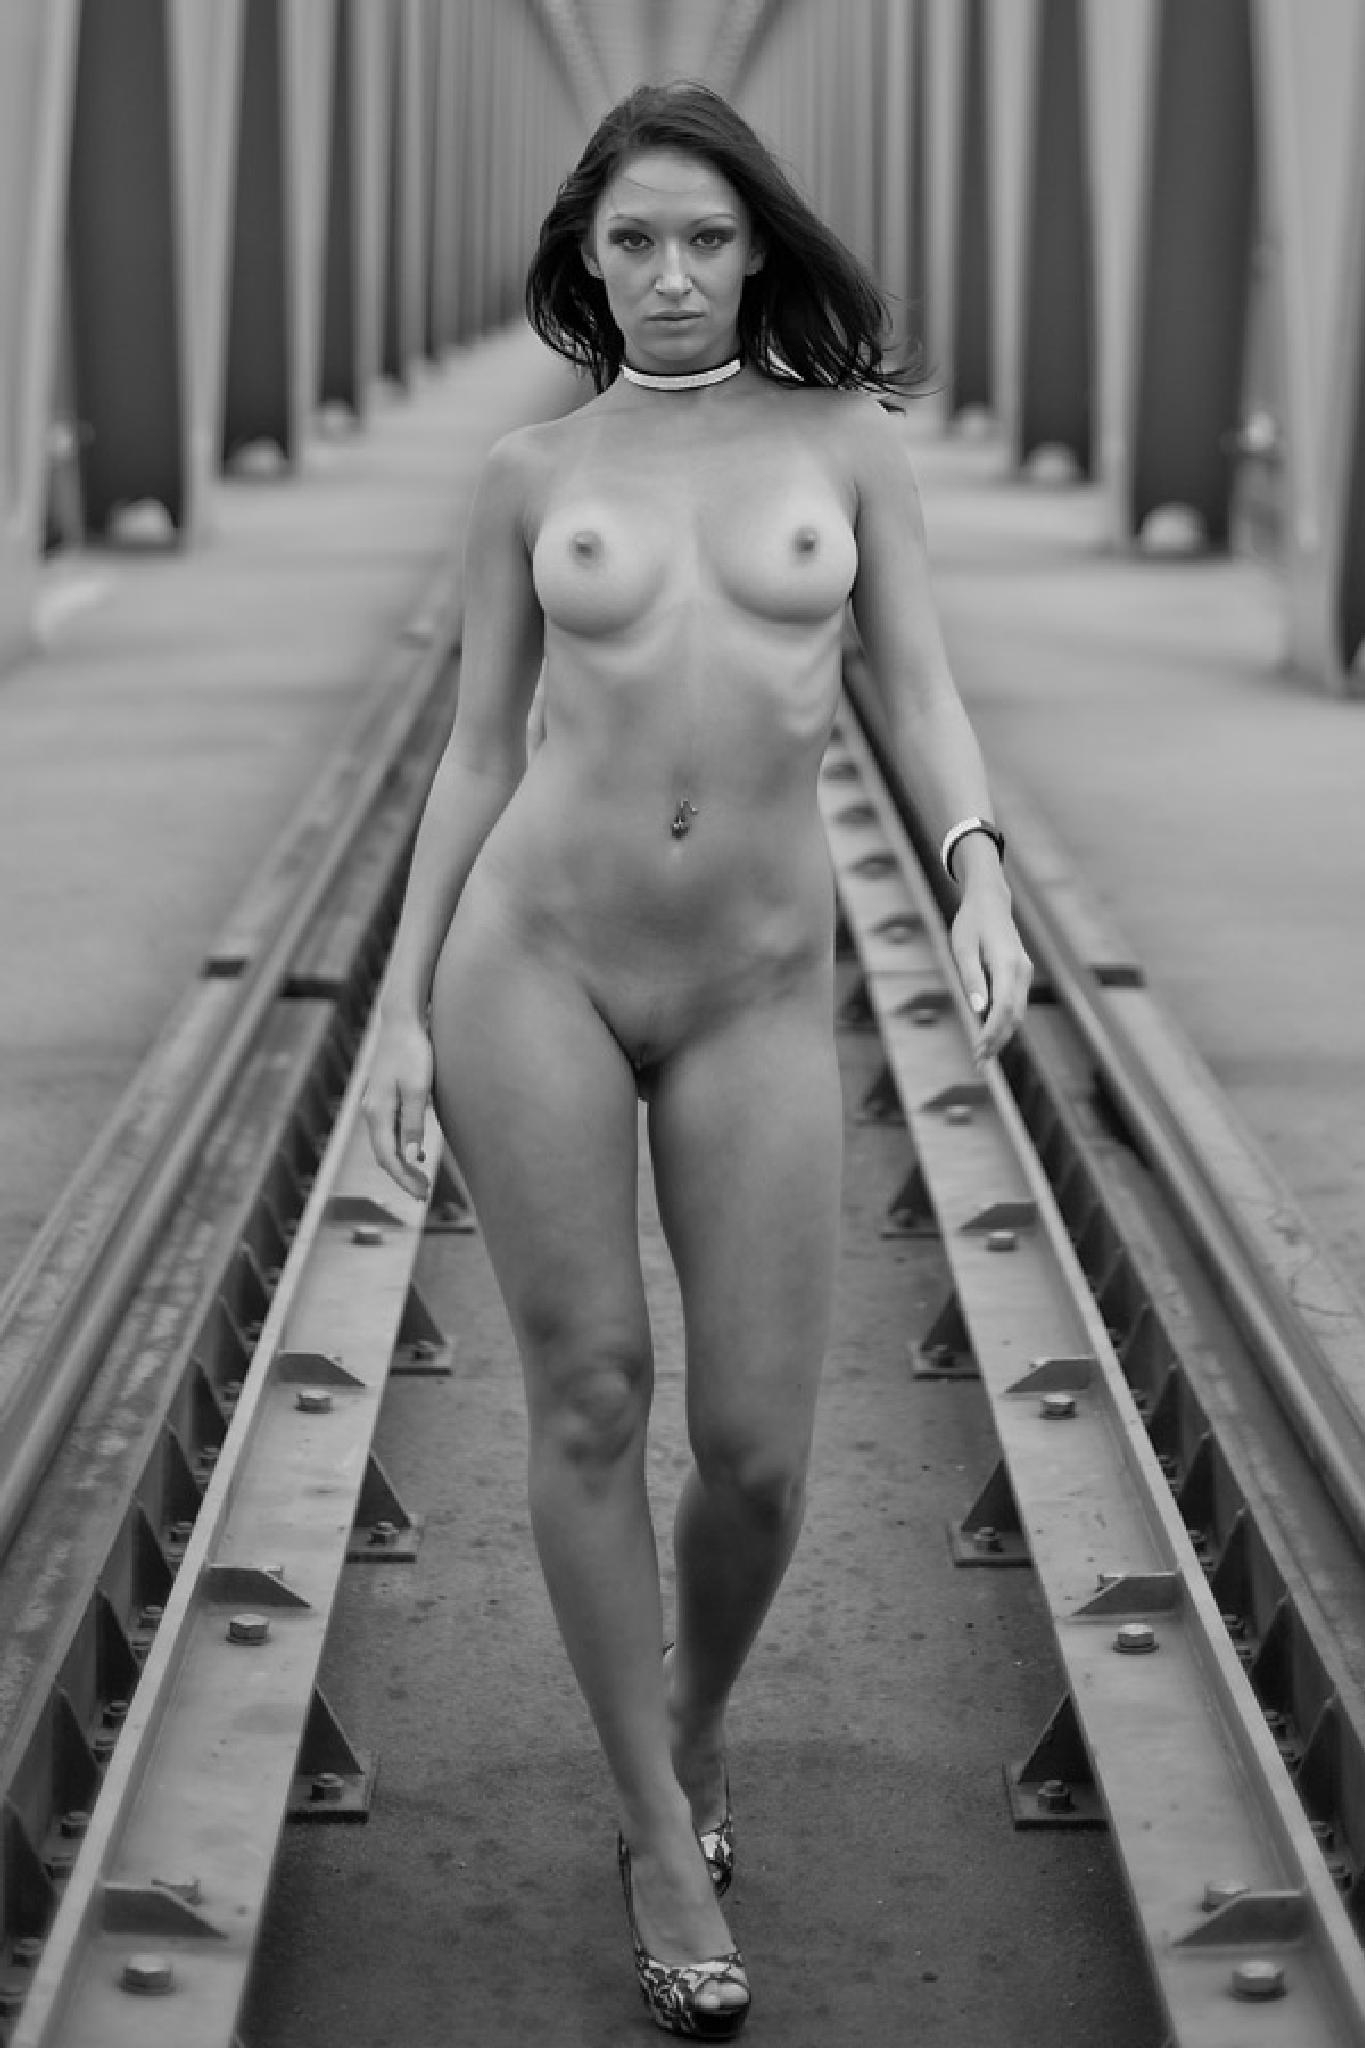 nude on the bridge by jozseftoth